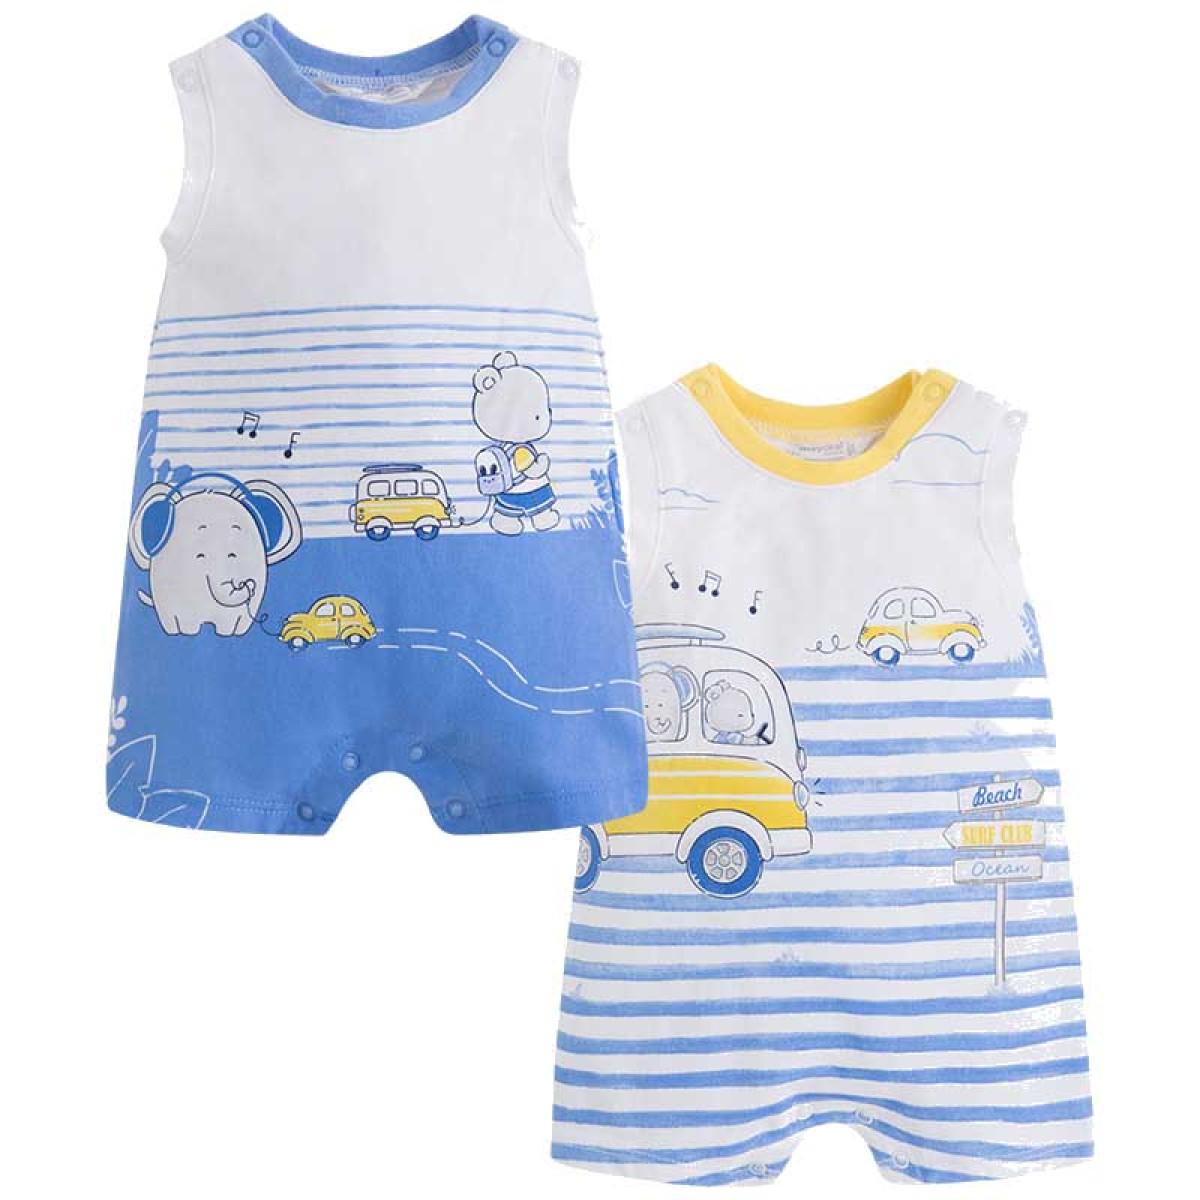 5032ce1e9c2 Σετ 2 φορμακια μακο πουκαμισο Mayoral 2801660 - μπλε